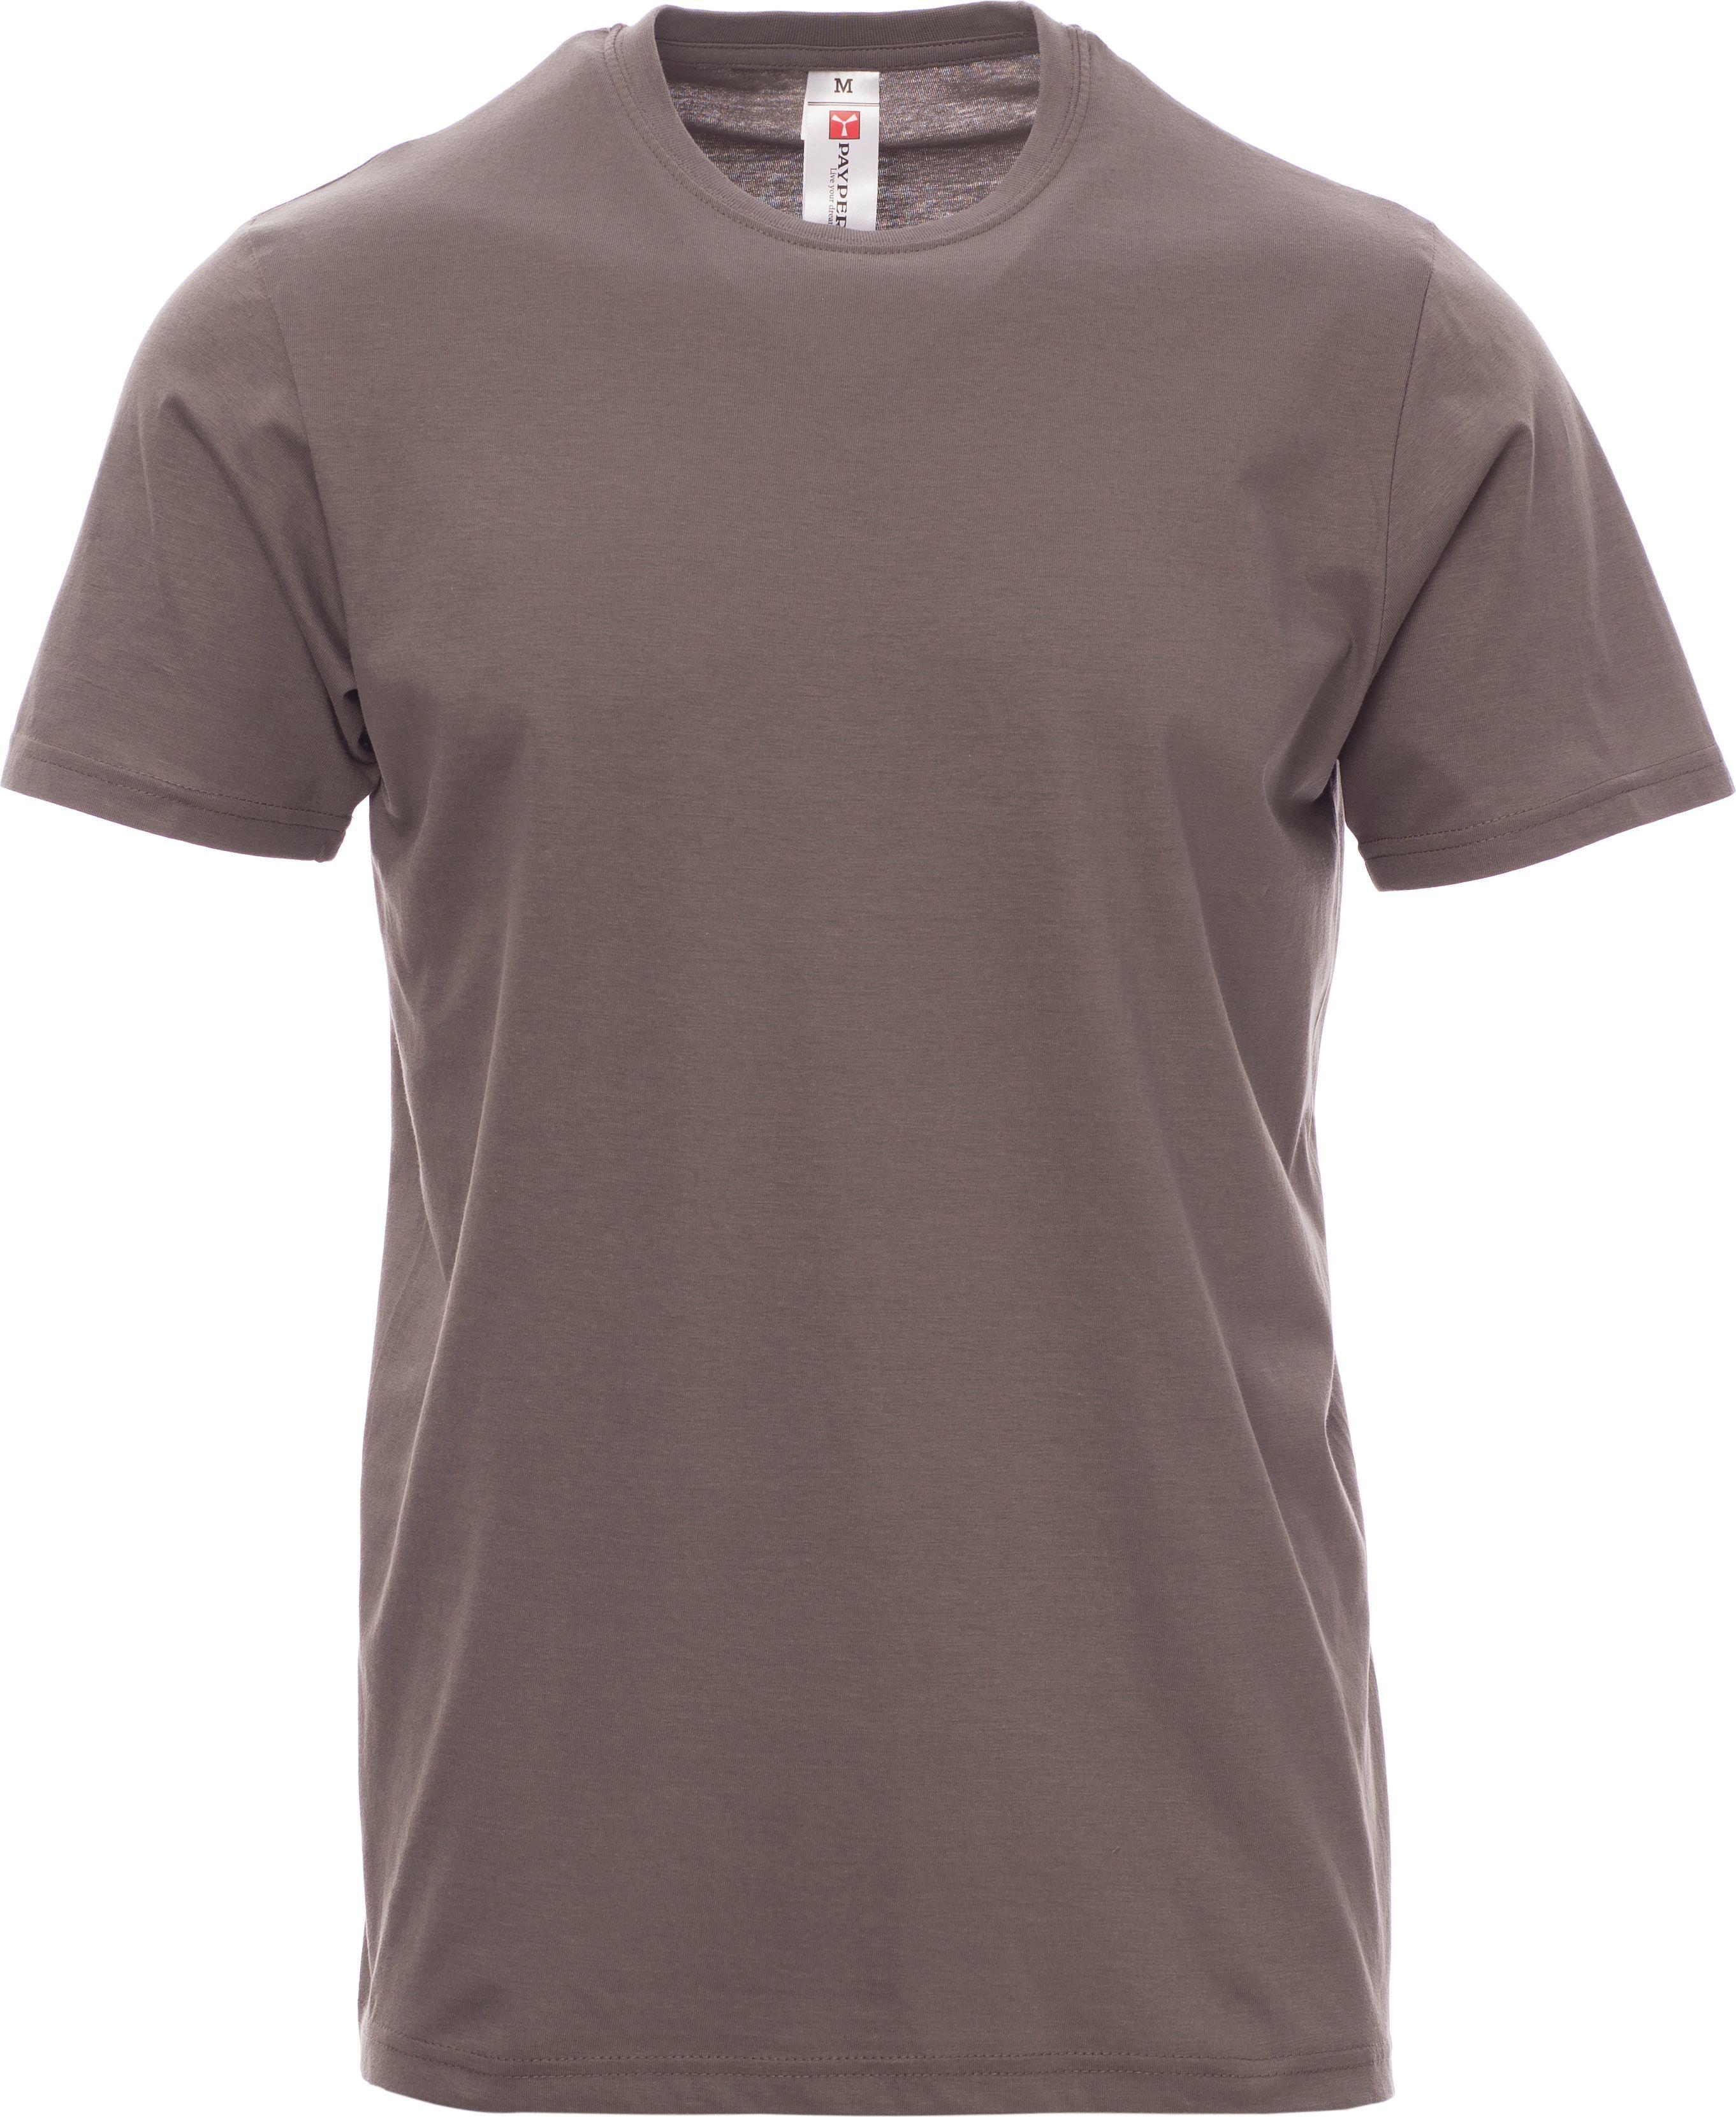 Tee-shirt Print - 32-1148-15